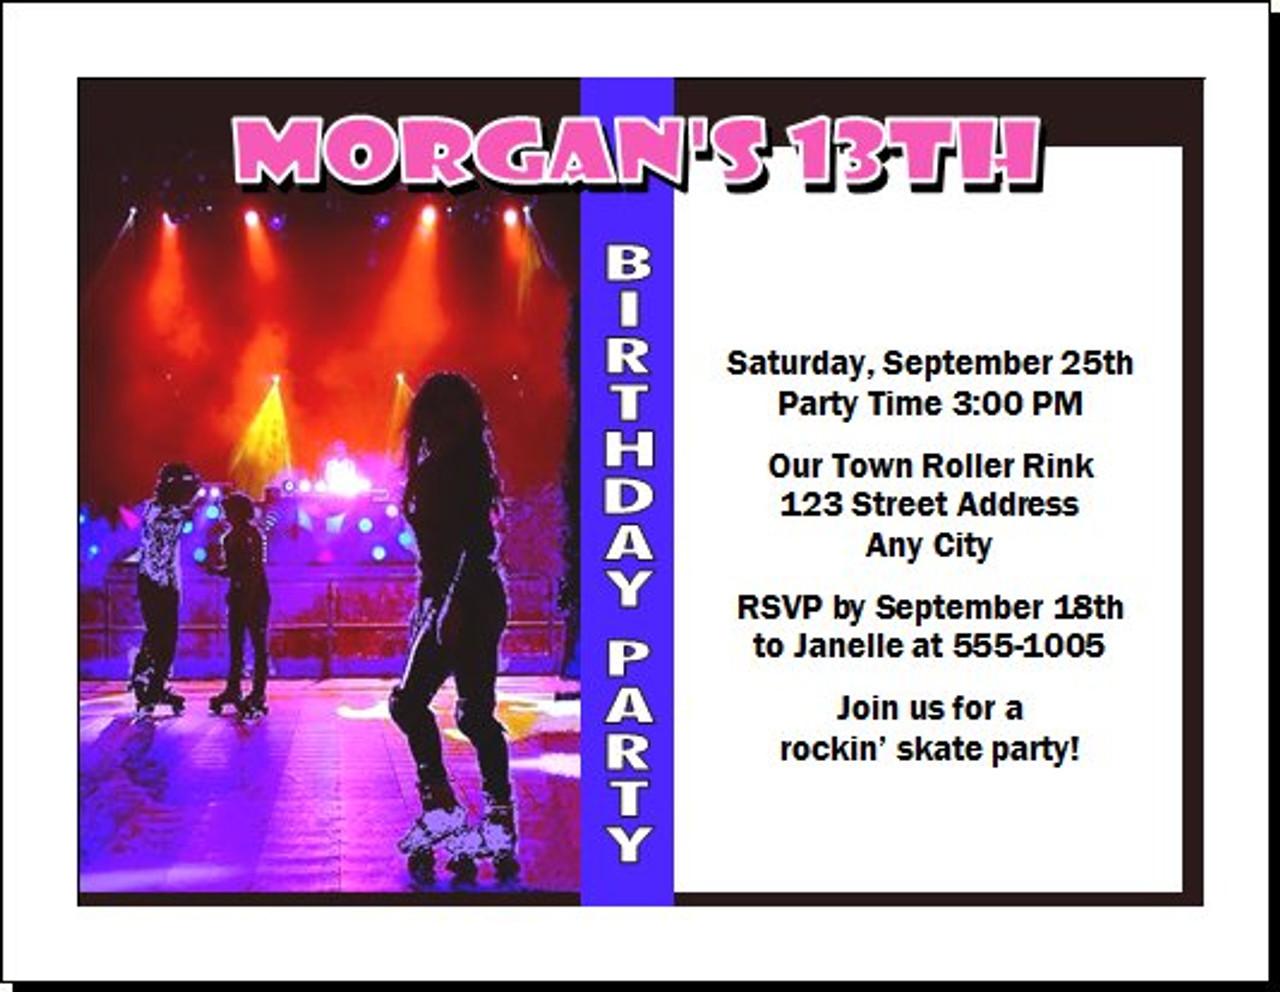 roller skating birthday party invitation - Roller Skating Birthday Party Invitations